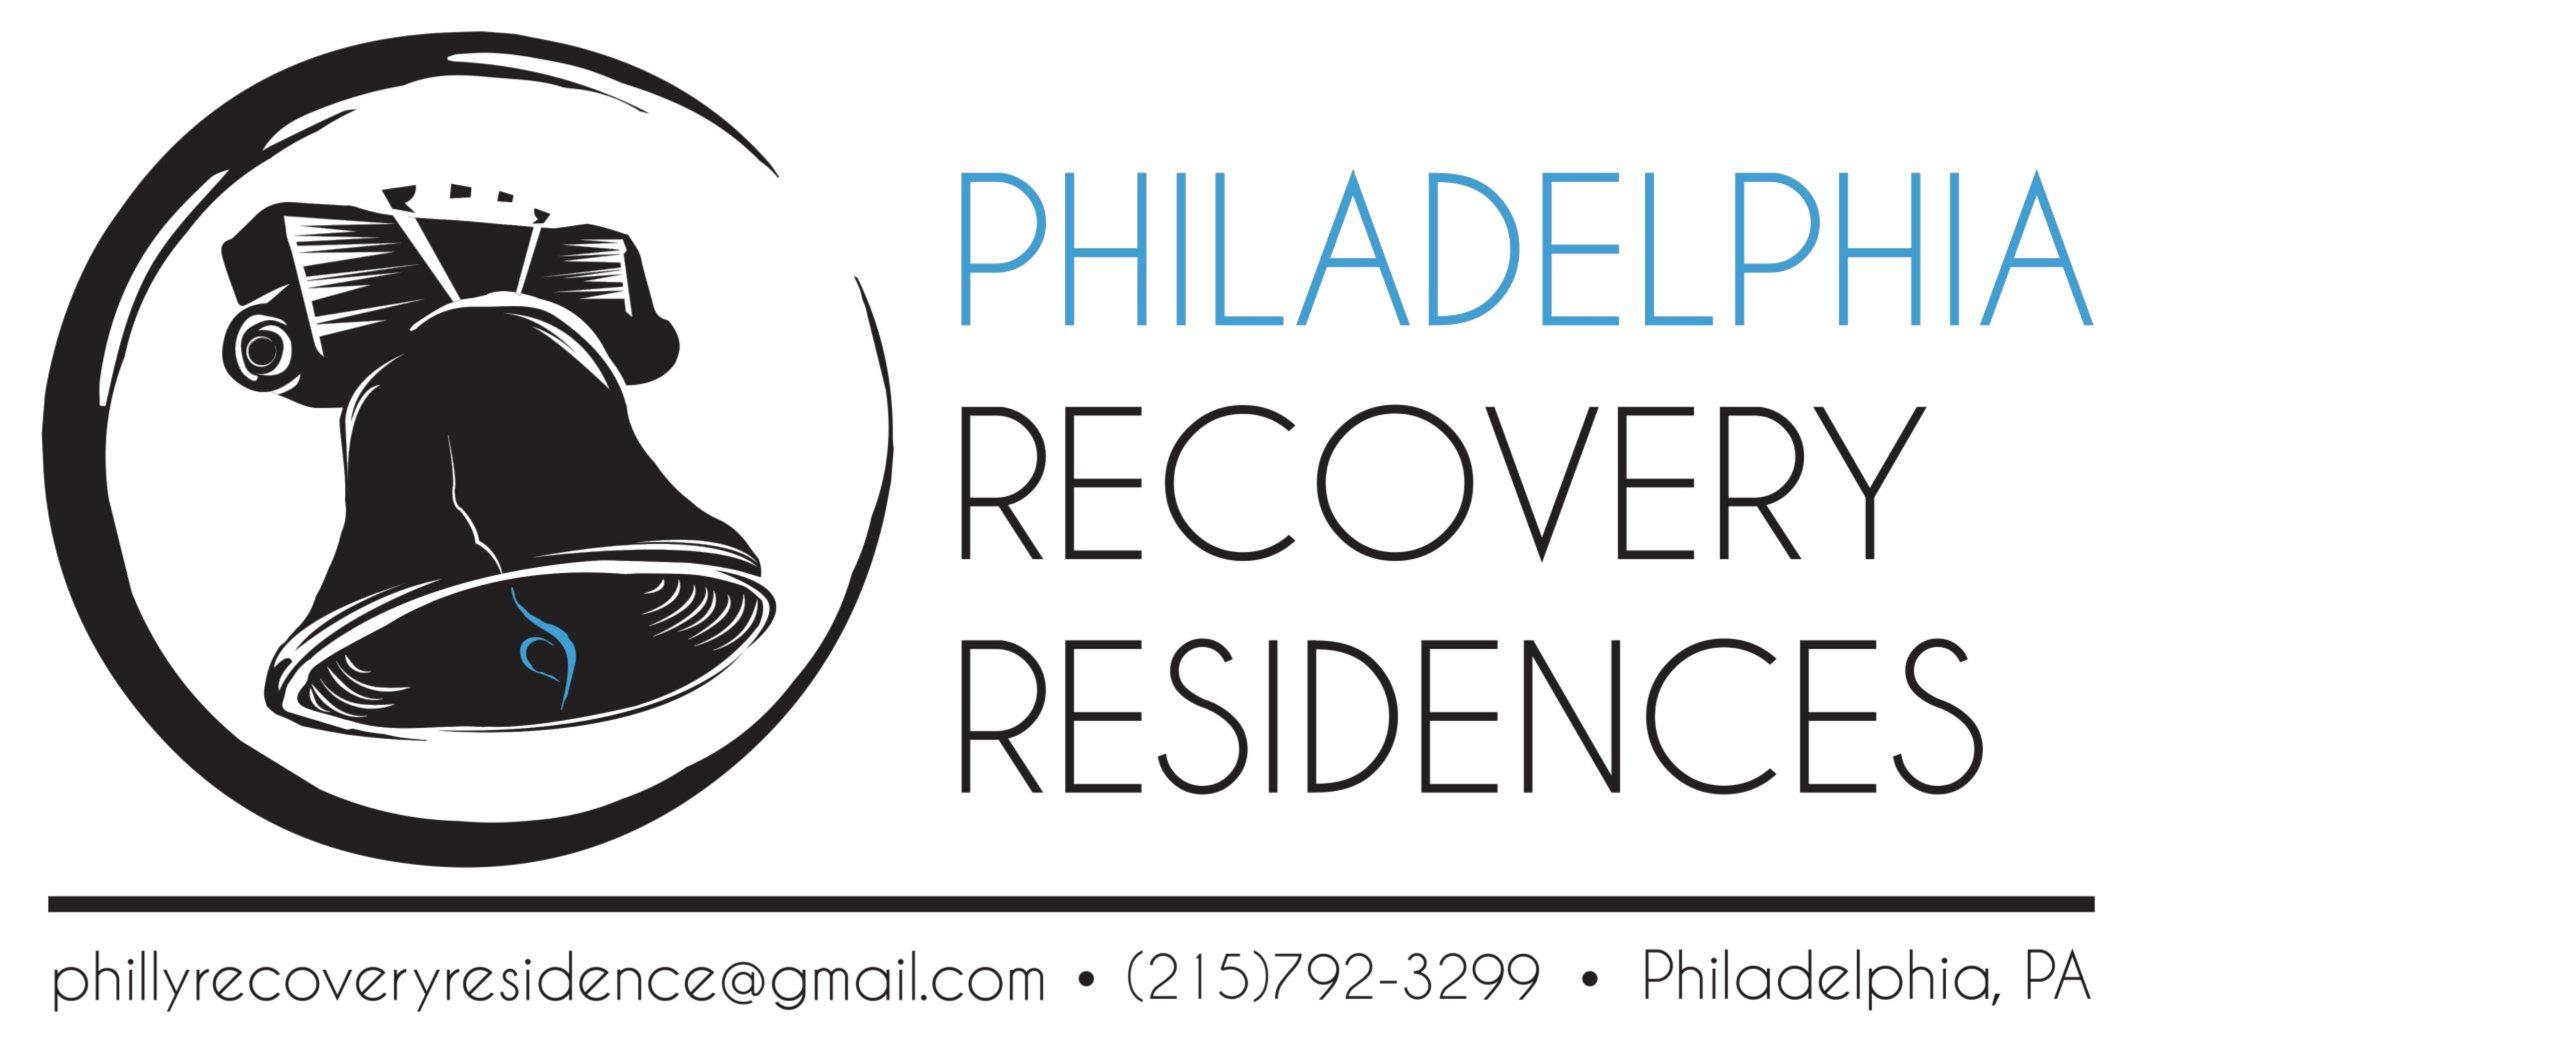 Philadelphia Recovery Residences